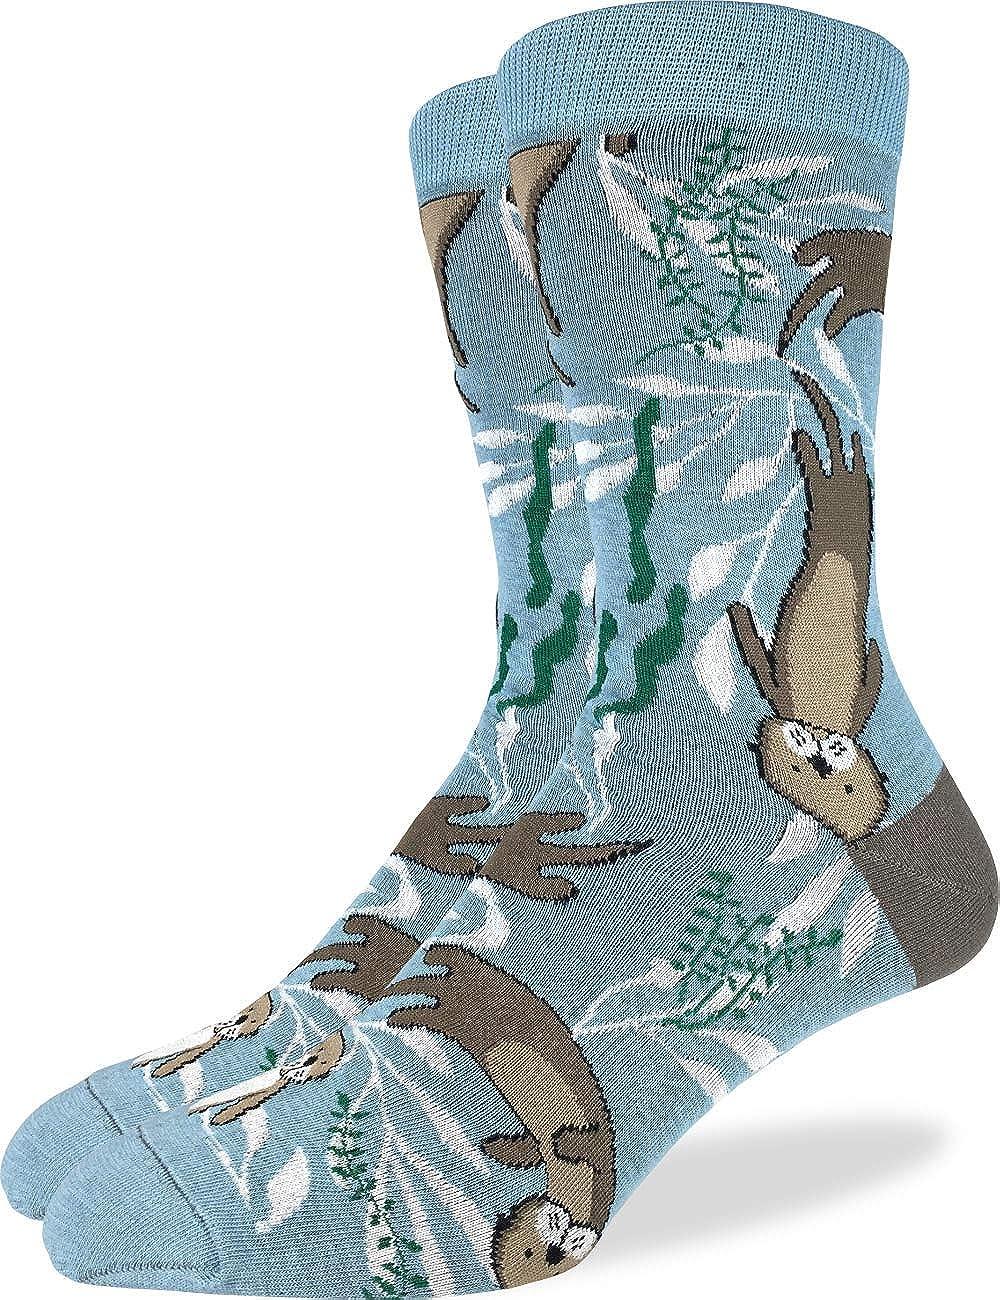 Good Luck Sock Men's Extra Large Sea Otter Socks, Size 13-17, Big & Tall